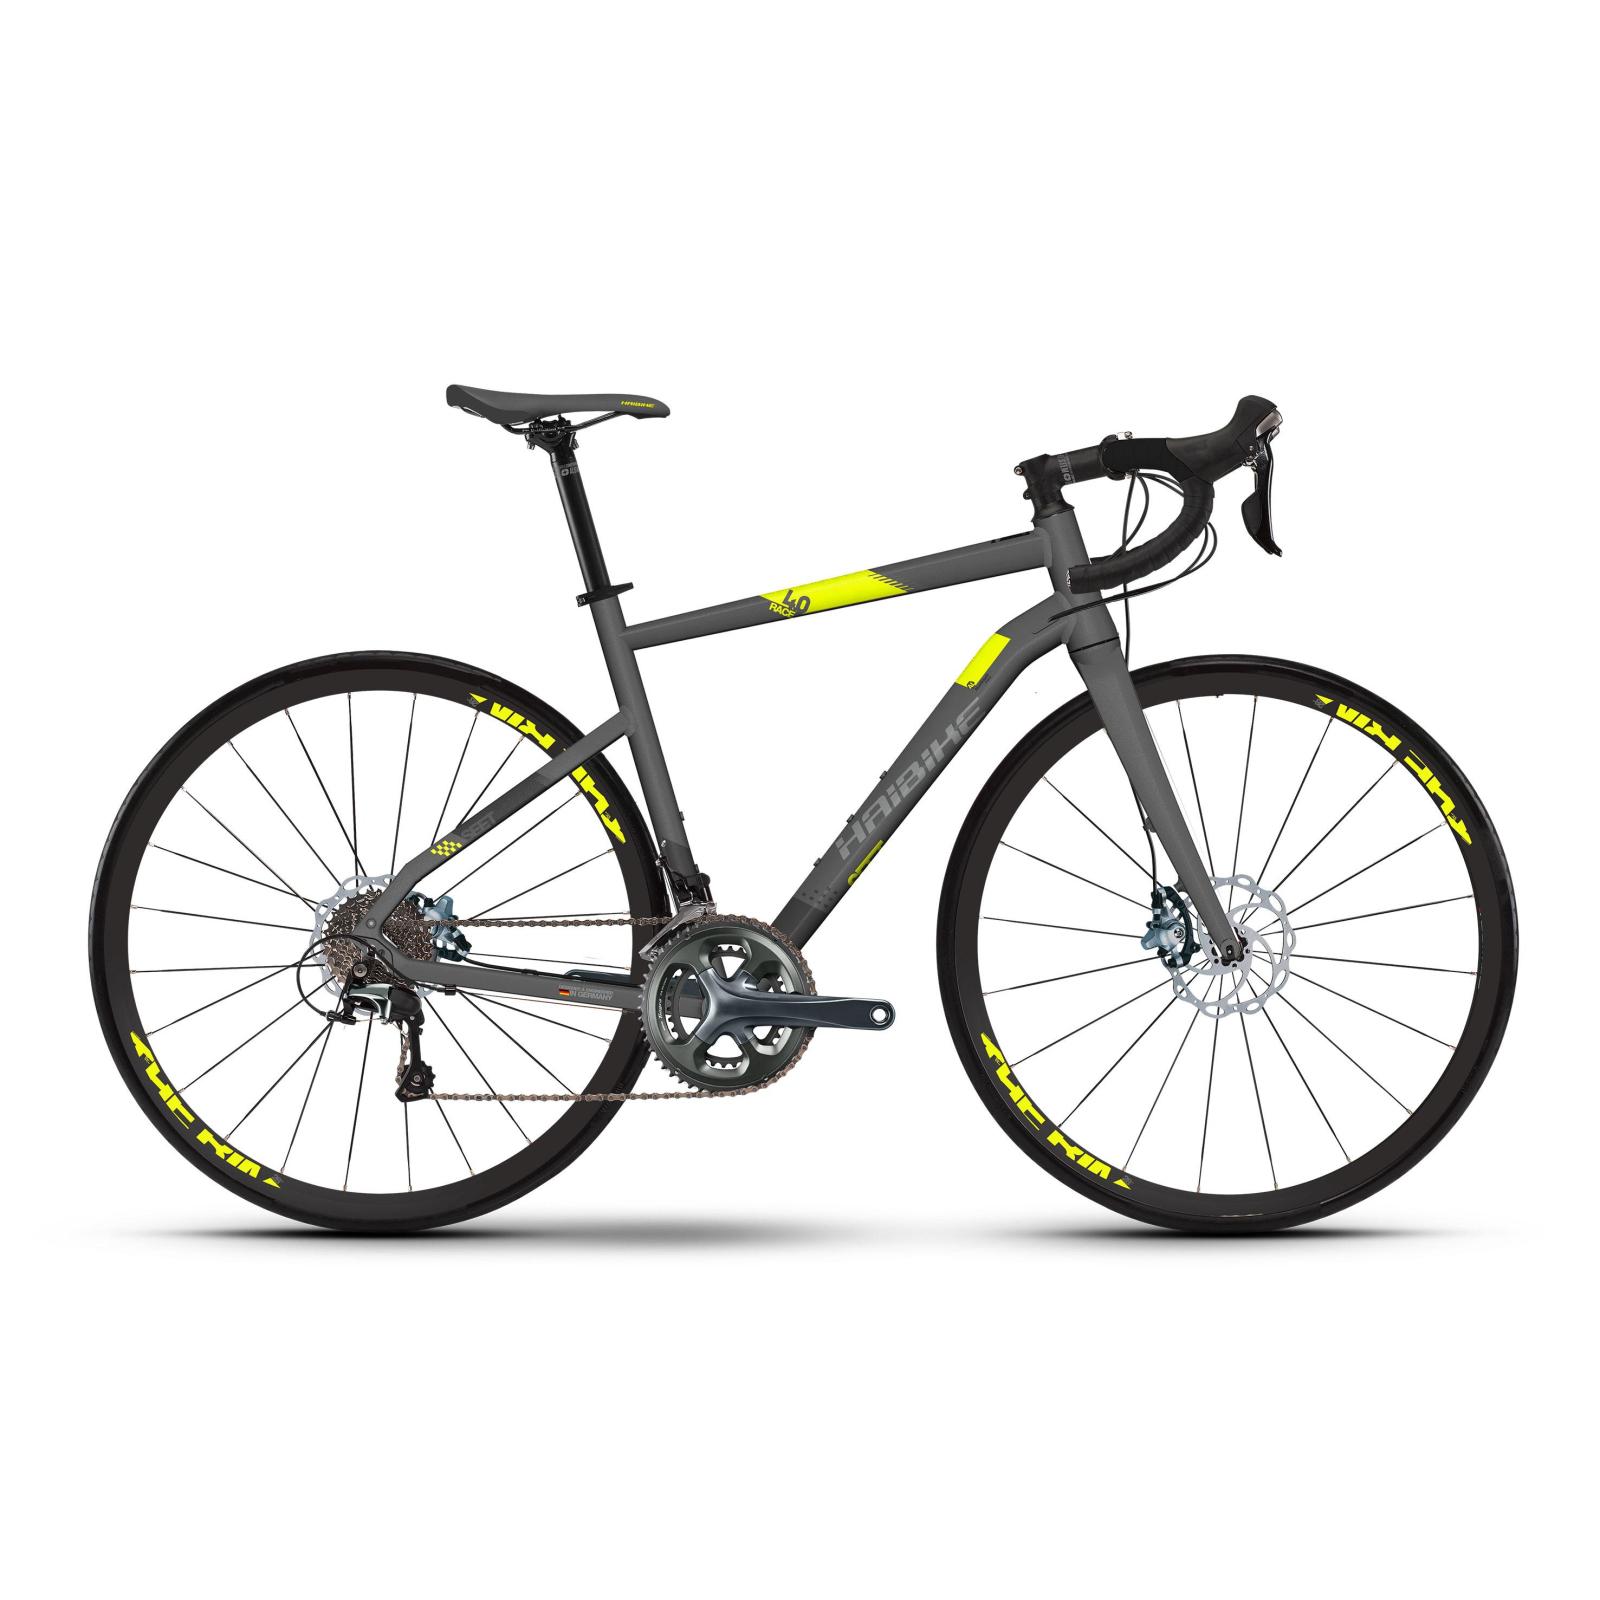 "Велосипед Haibike SEET Race 4.0 28"", рама 53см, 2018 (4100254853)"